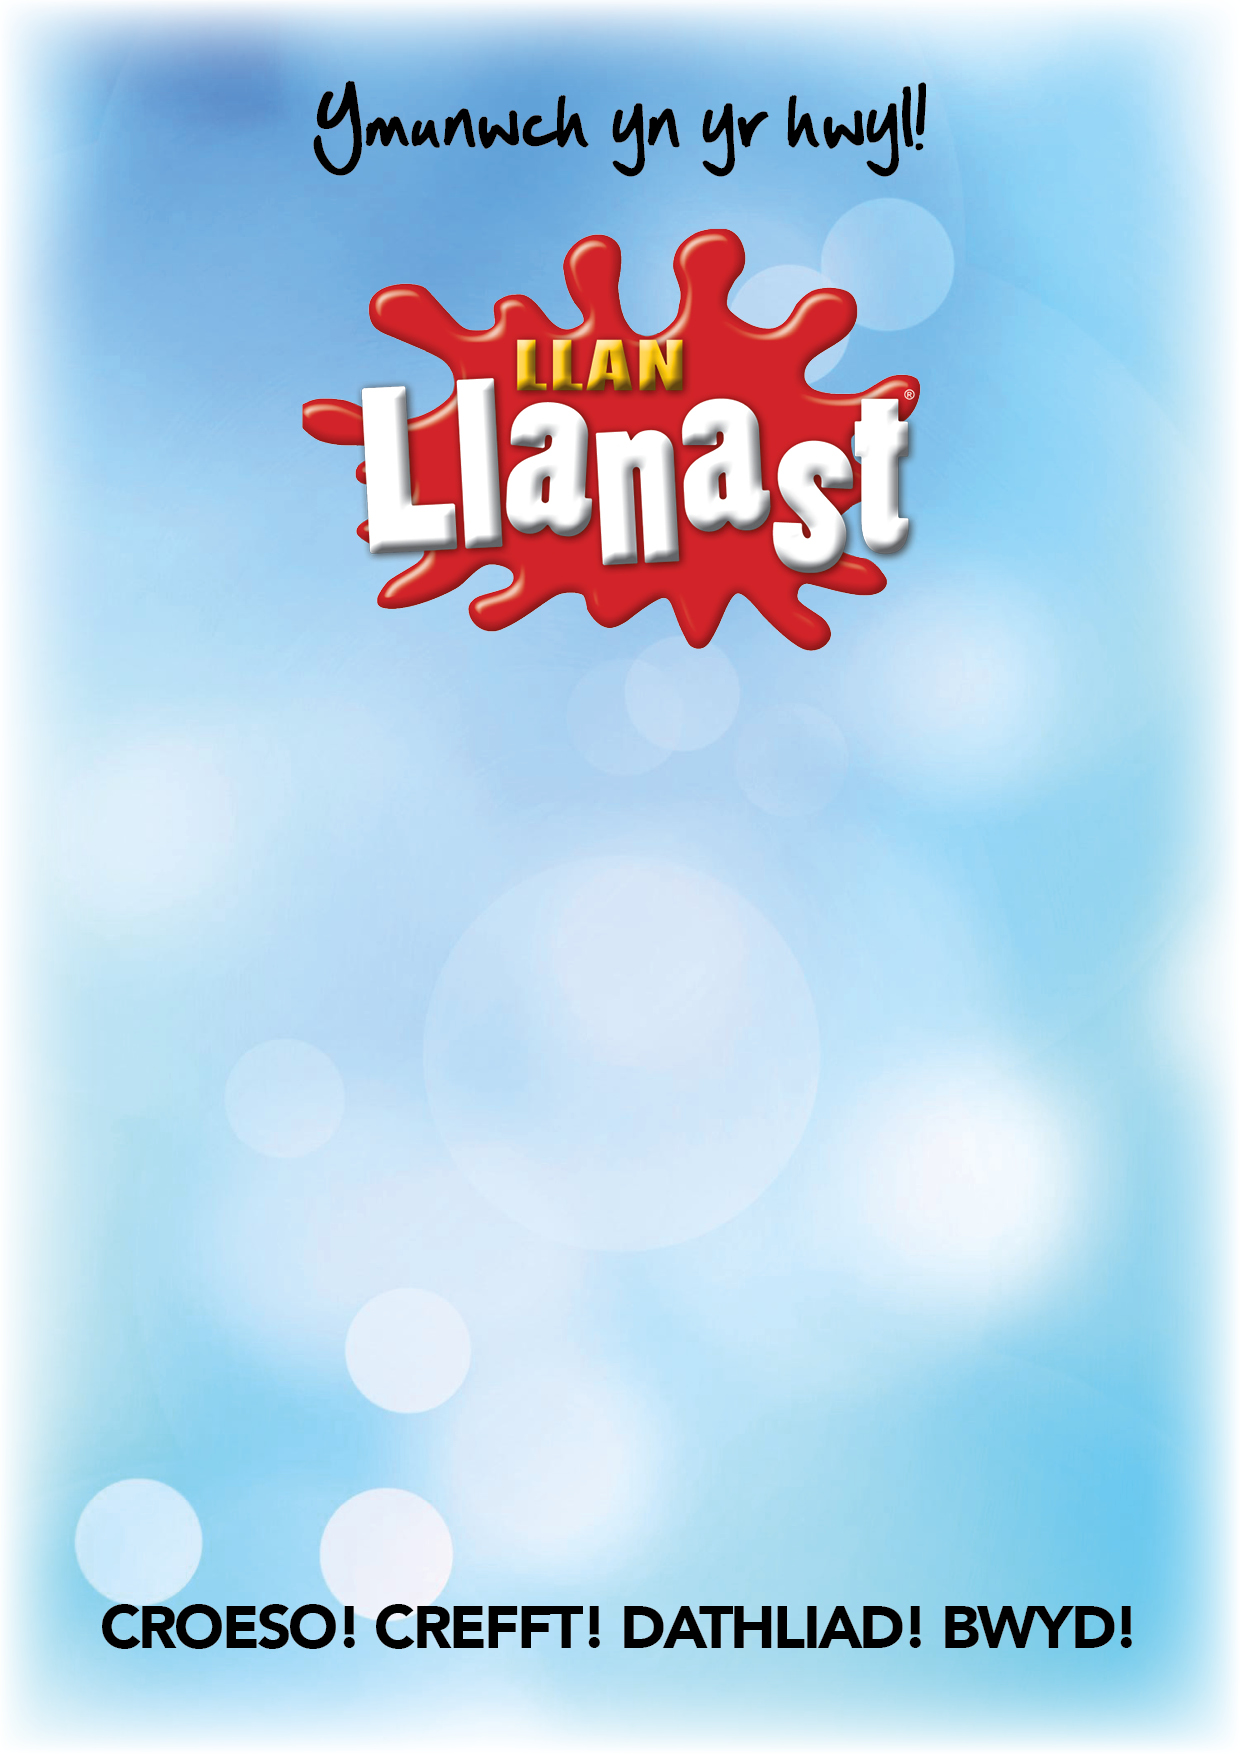 posteri llan llanast3